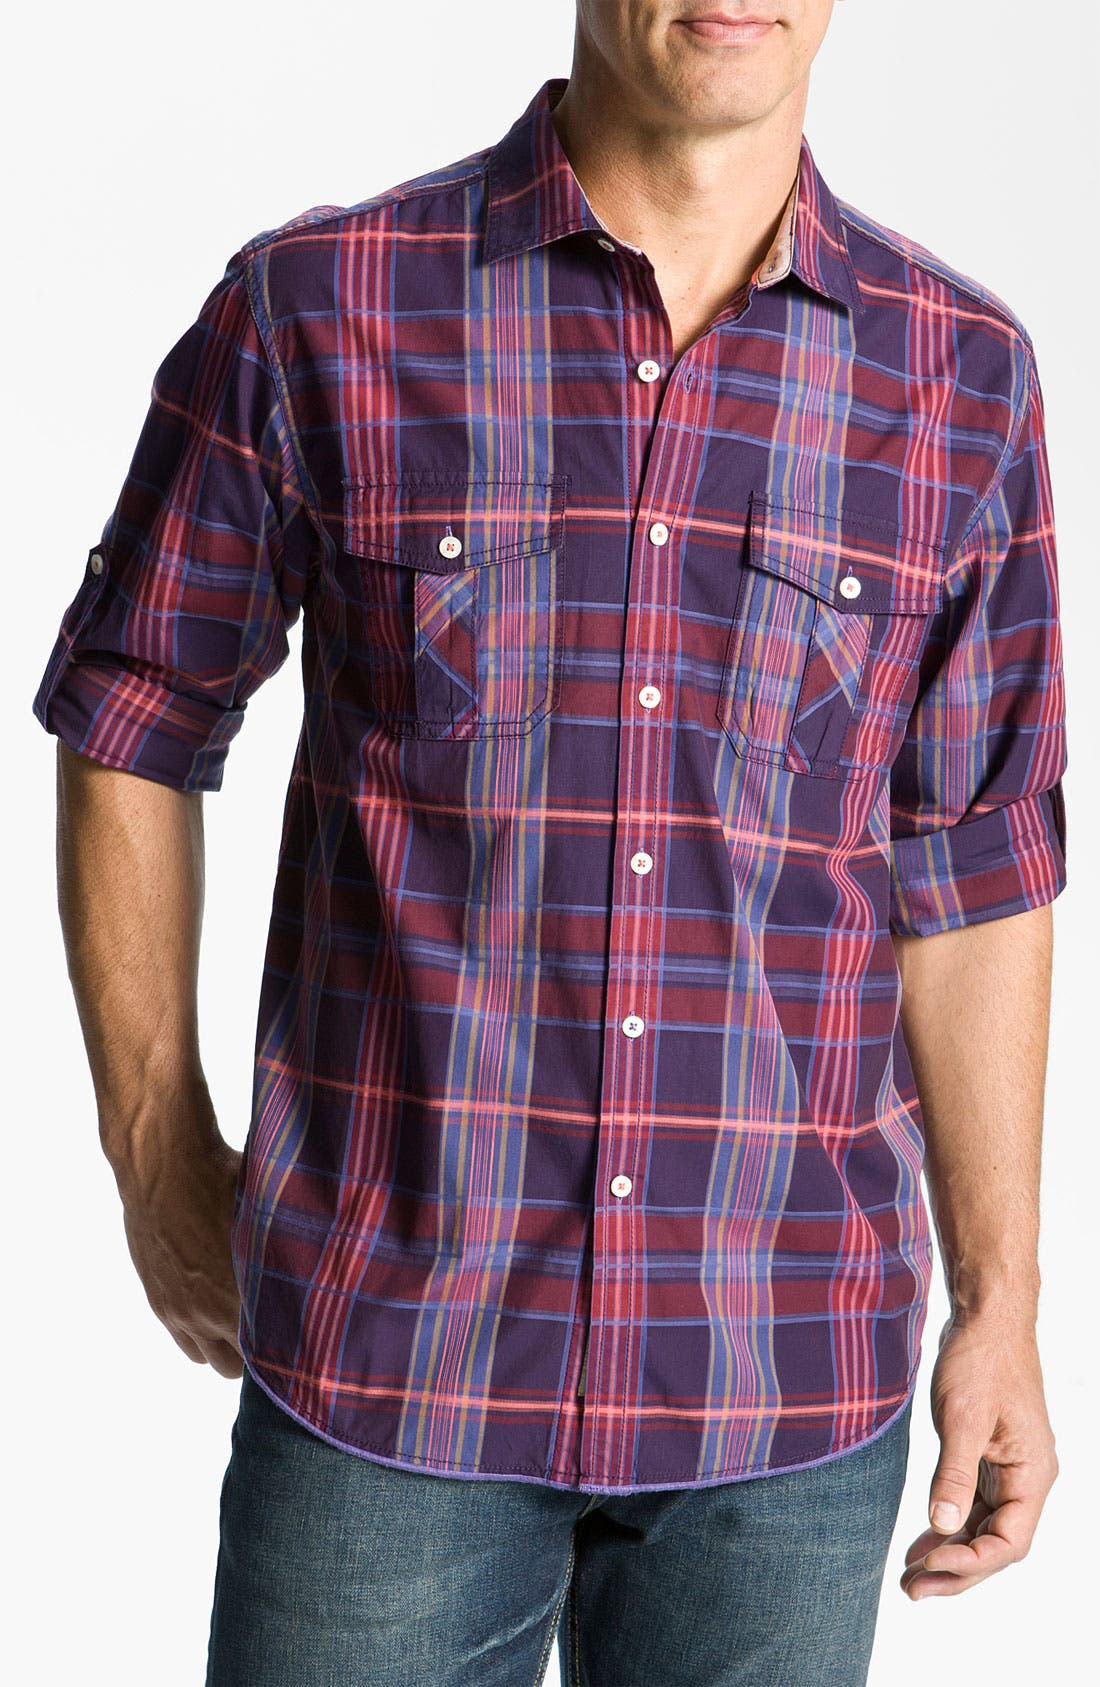 Alternate Image 1 Selected - Tommy Bahama Denim 'Pagoda' Plaid Sport Shirt